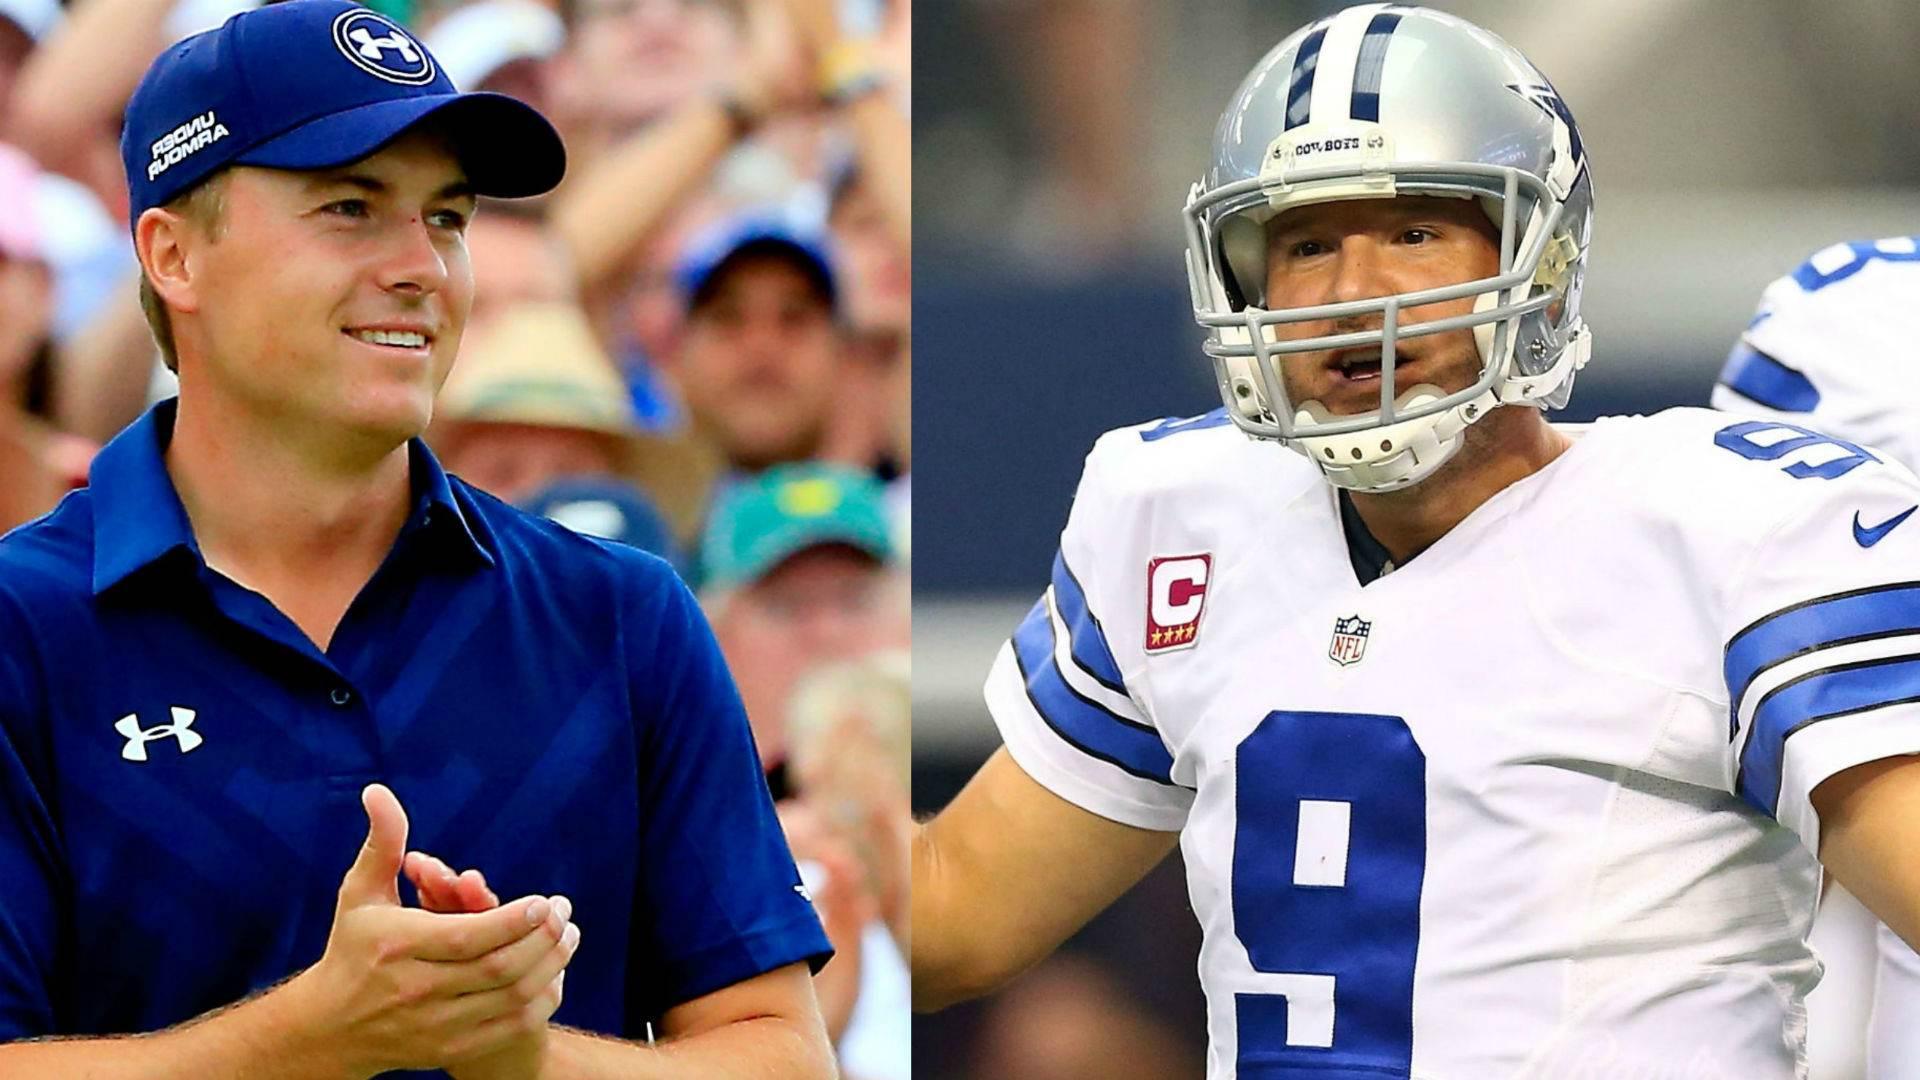 Cowboys Headlines - [VIDEO] Tony Romo In New Jordan Spieth Commercial 2